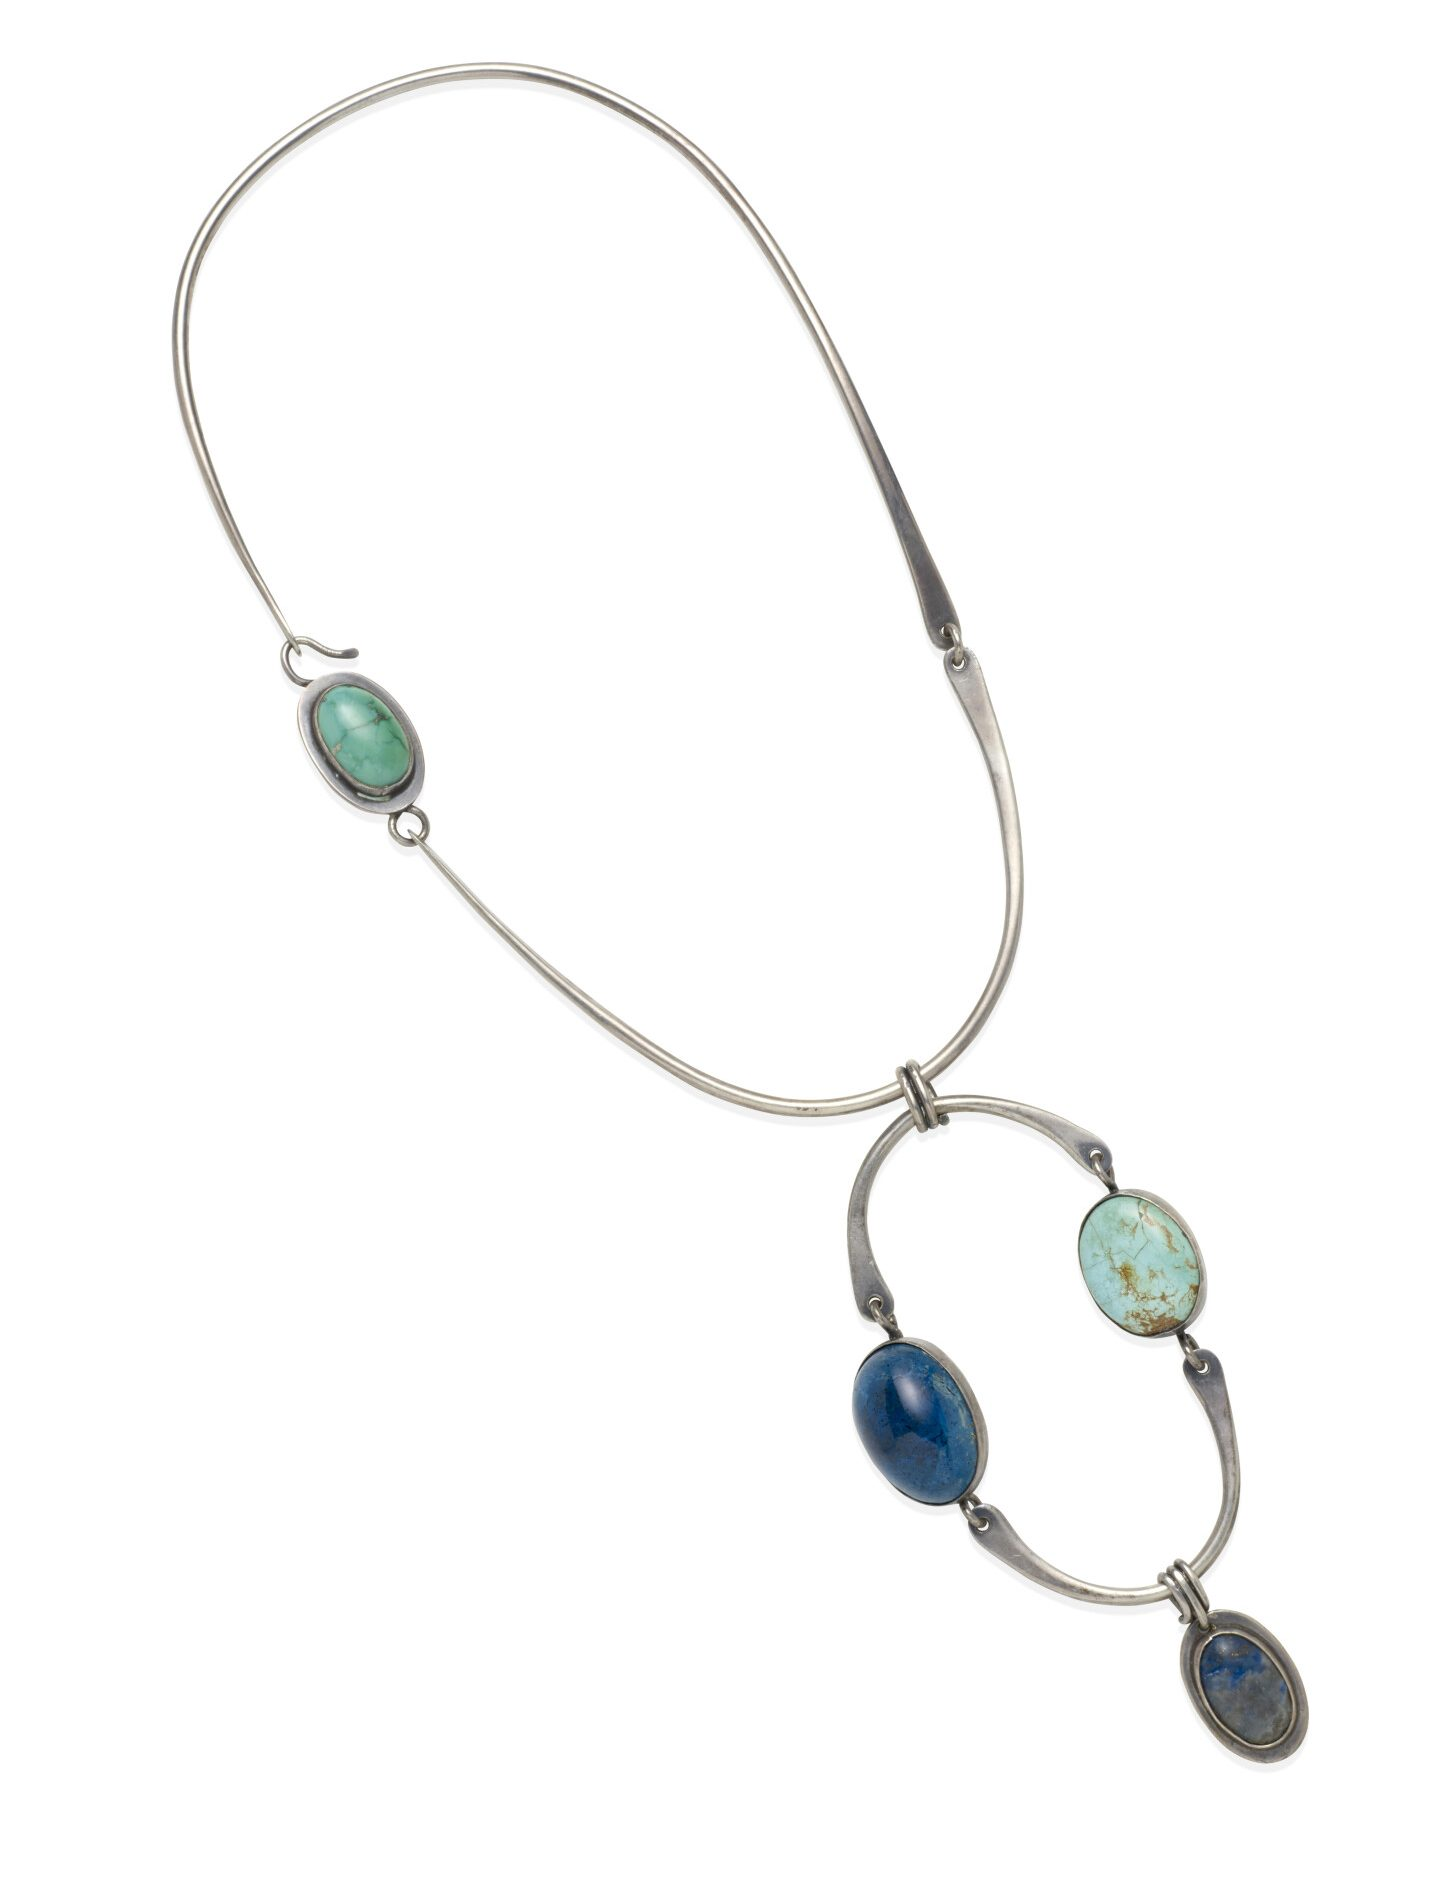 Art Smith, halssieraad. Collectie Jill & Byron Crawford. Foto Bonhams, zilver, turkoois, lapis lazuli